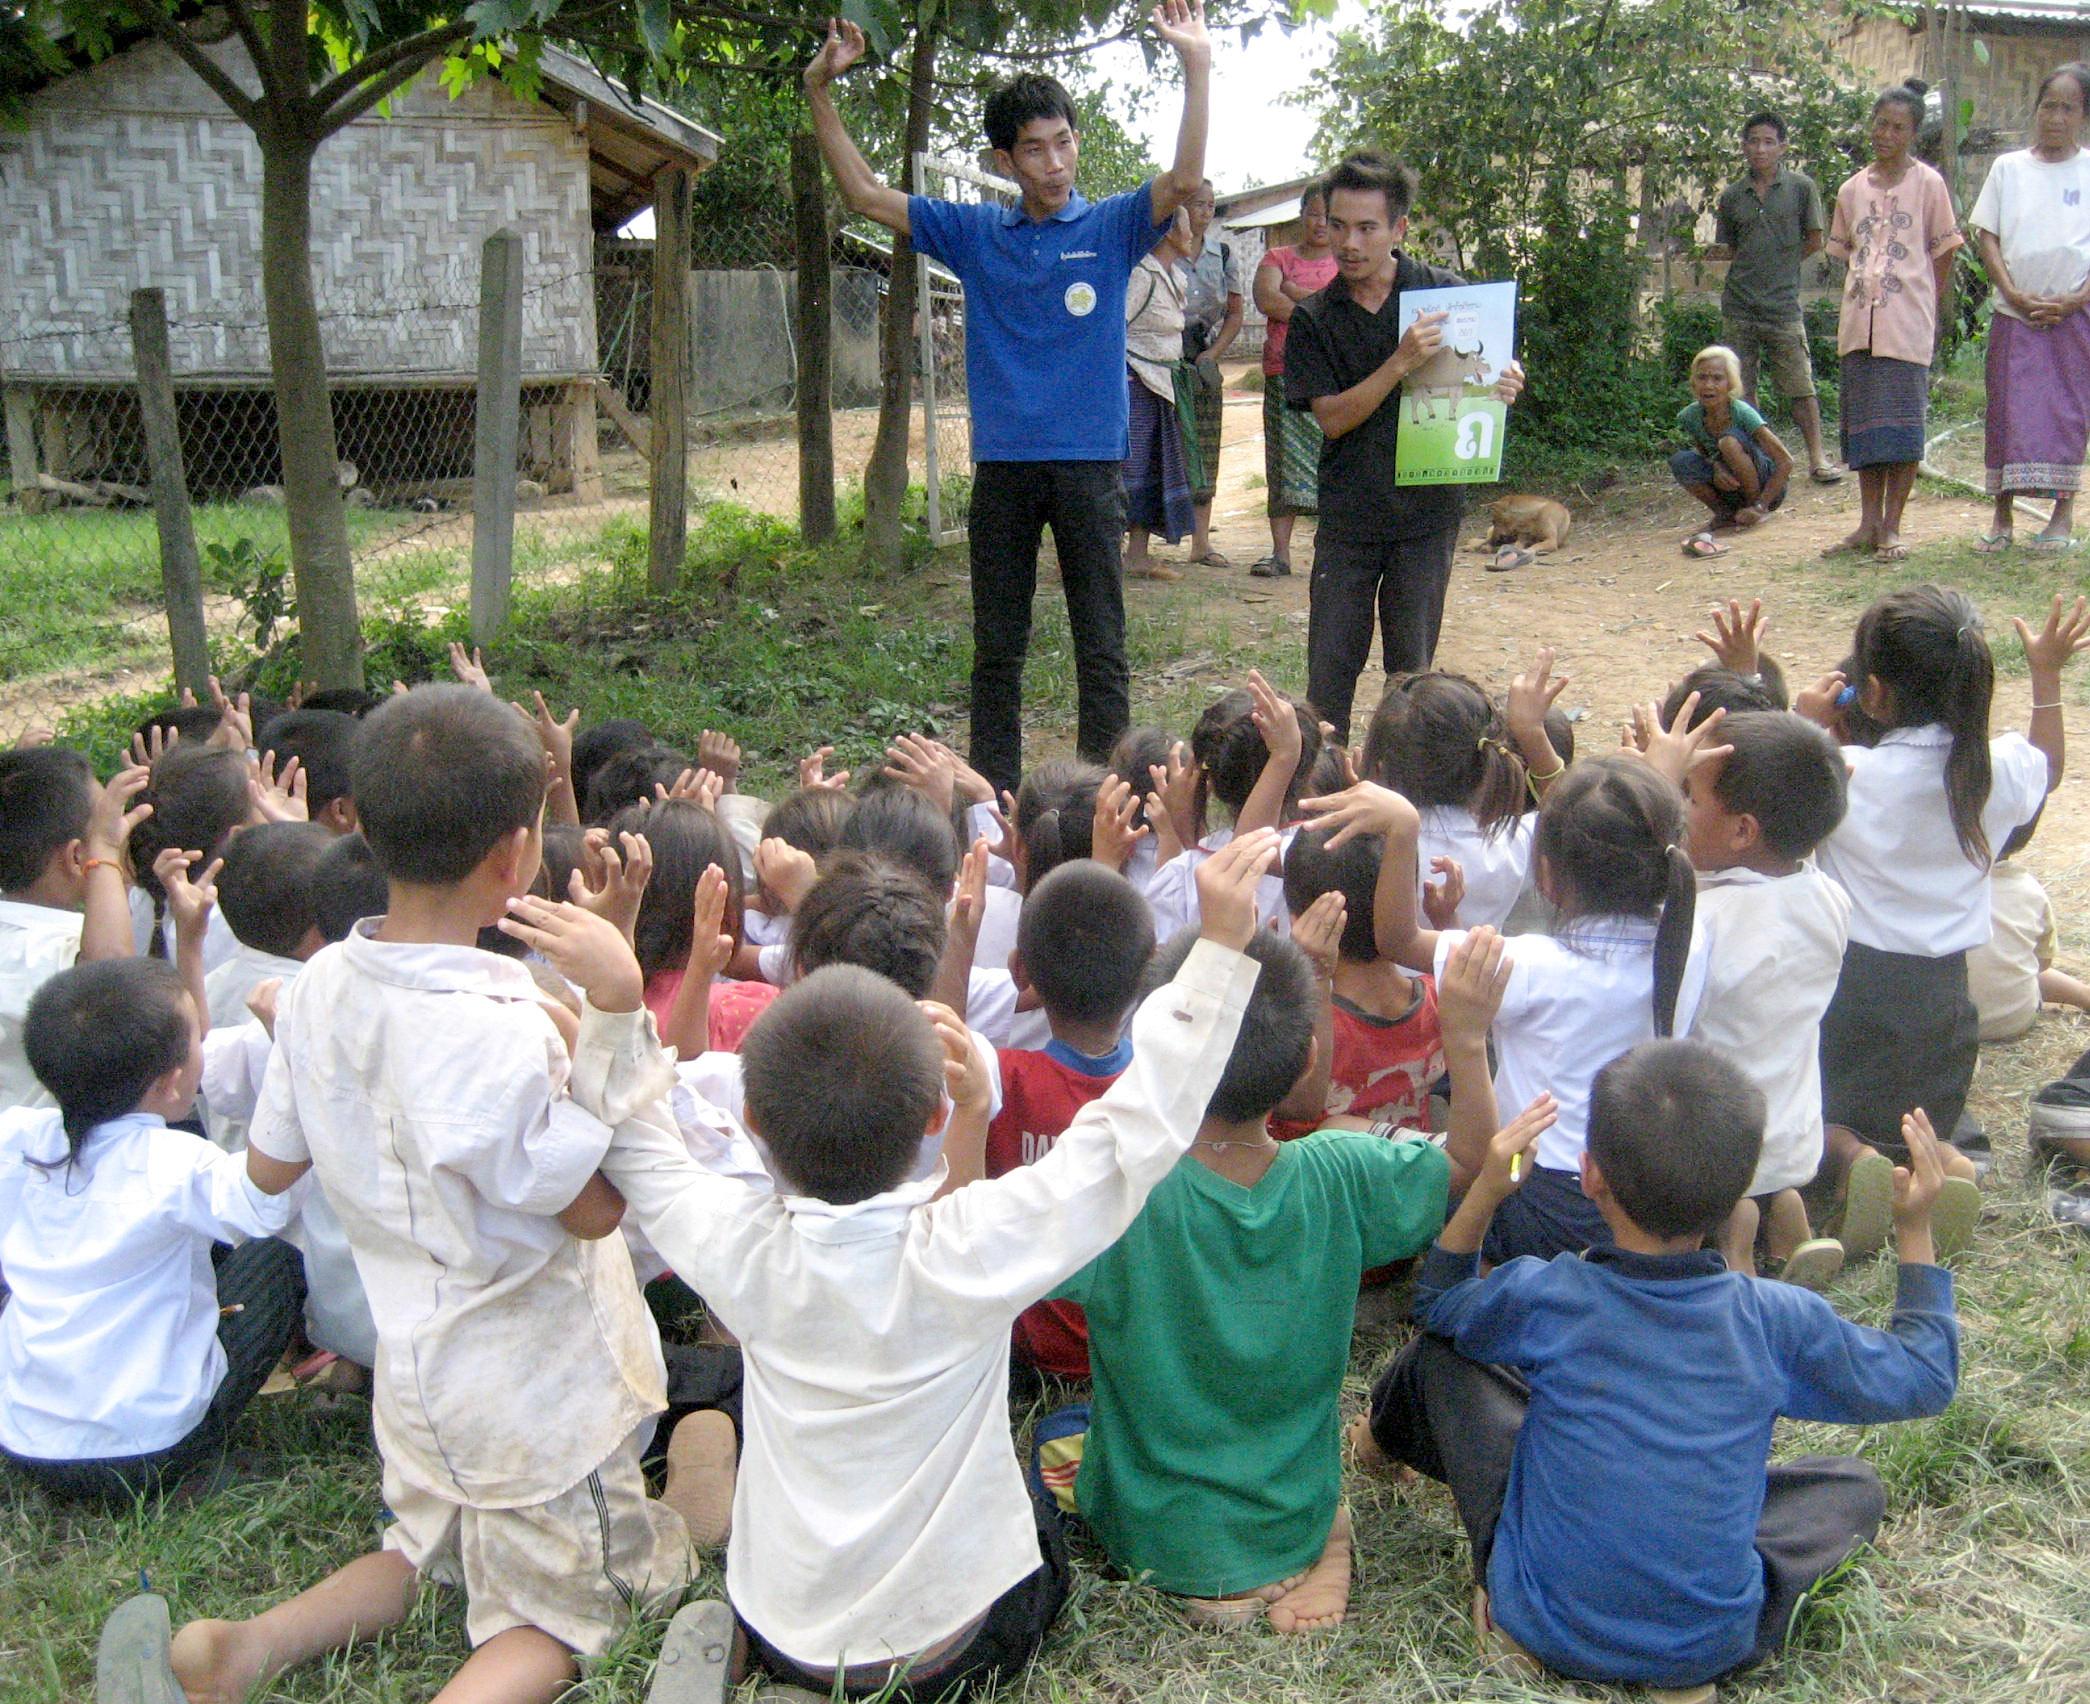 File:Lao sign language 025 jpg - Wikimedia Commons